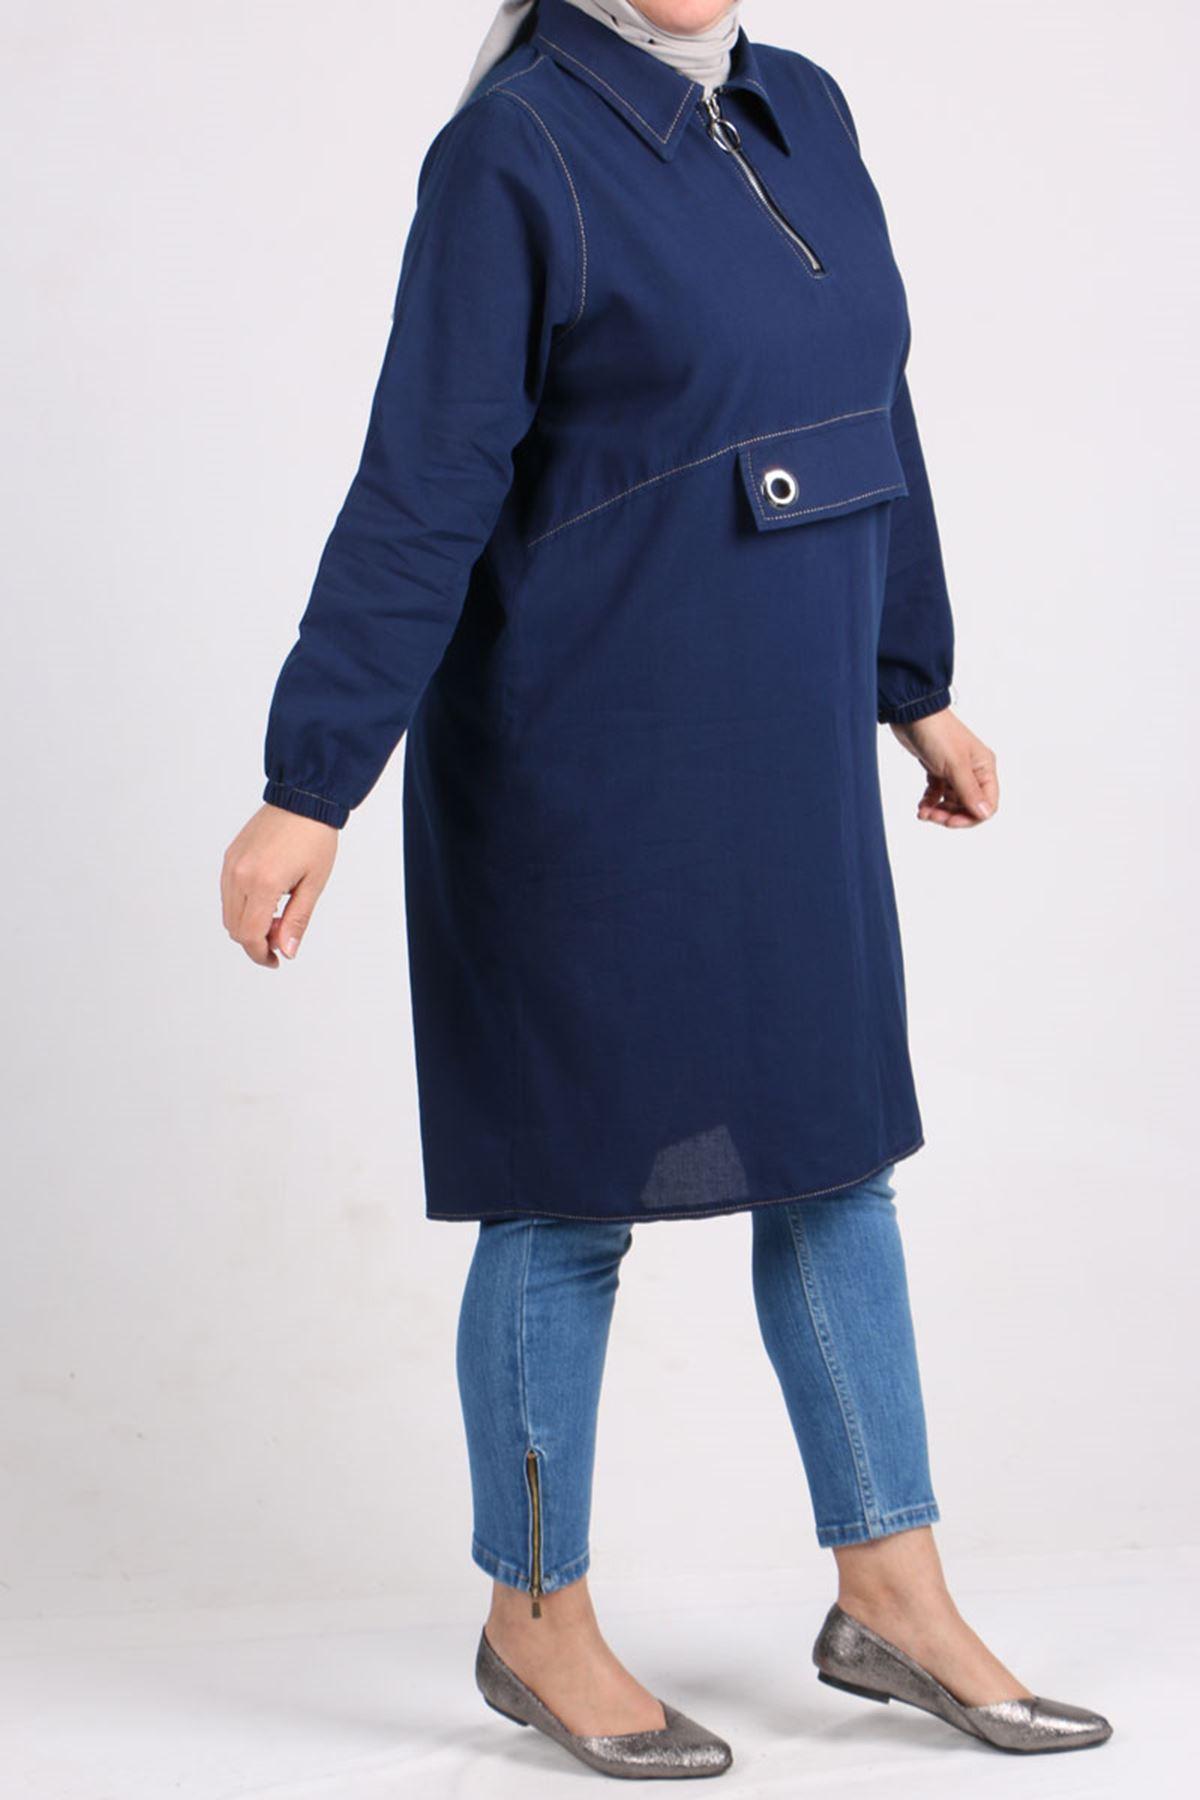 8436 Plus Size Bird Eye Detailed Denim Tunic - Navy Blue